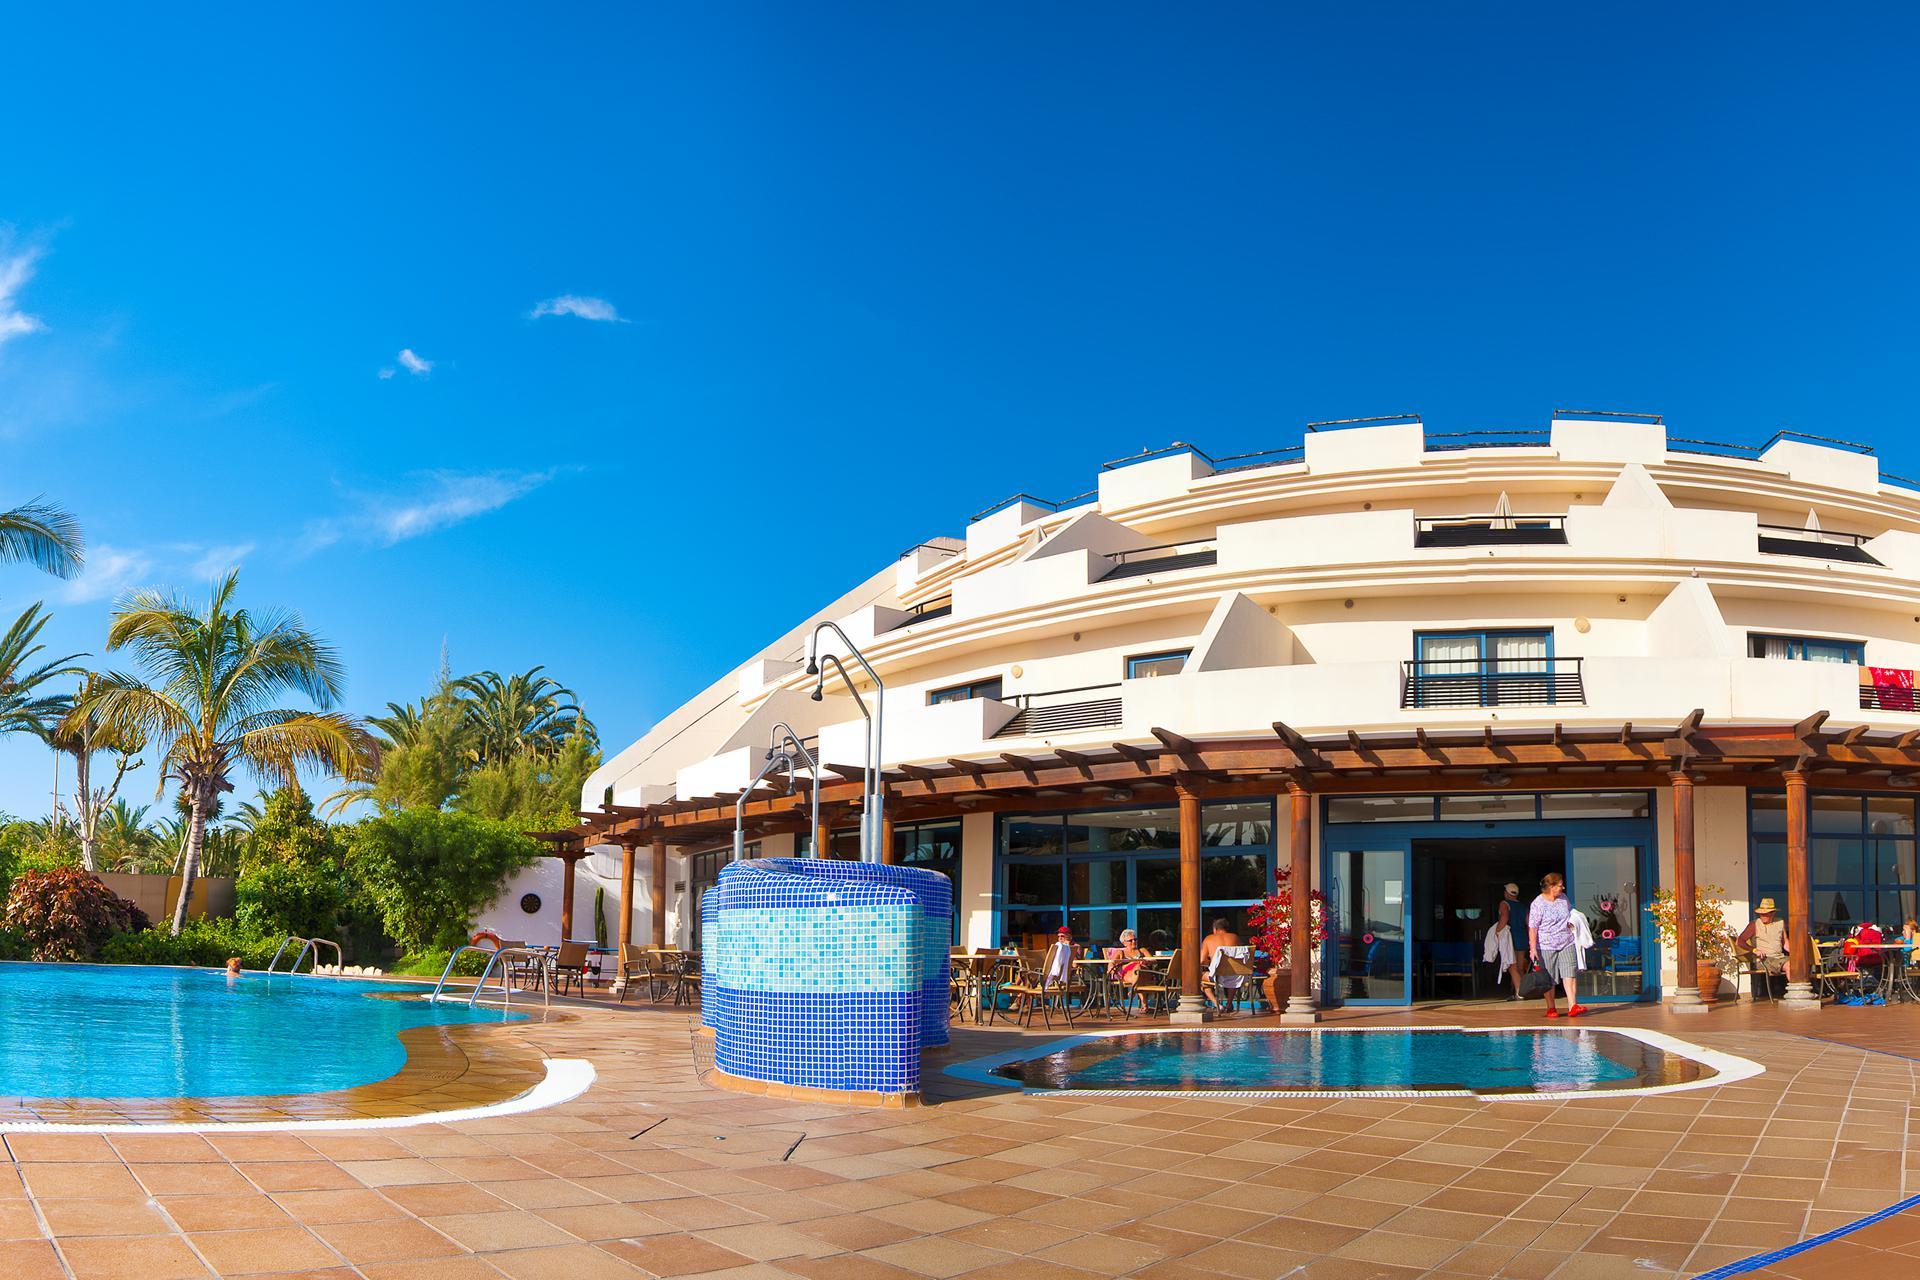 Hotel Sbh Crystal Beach Fuerteventura Spanien Sunweb